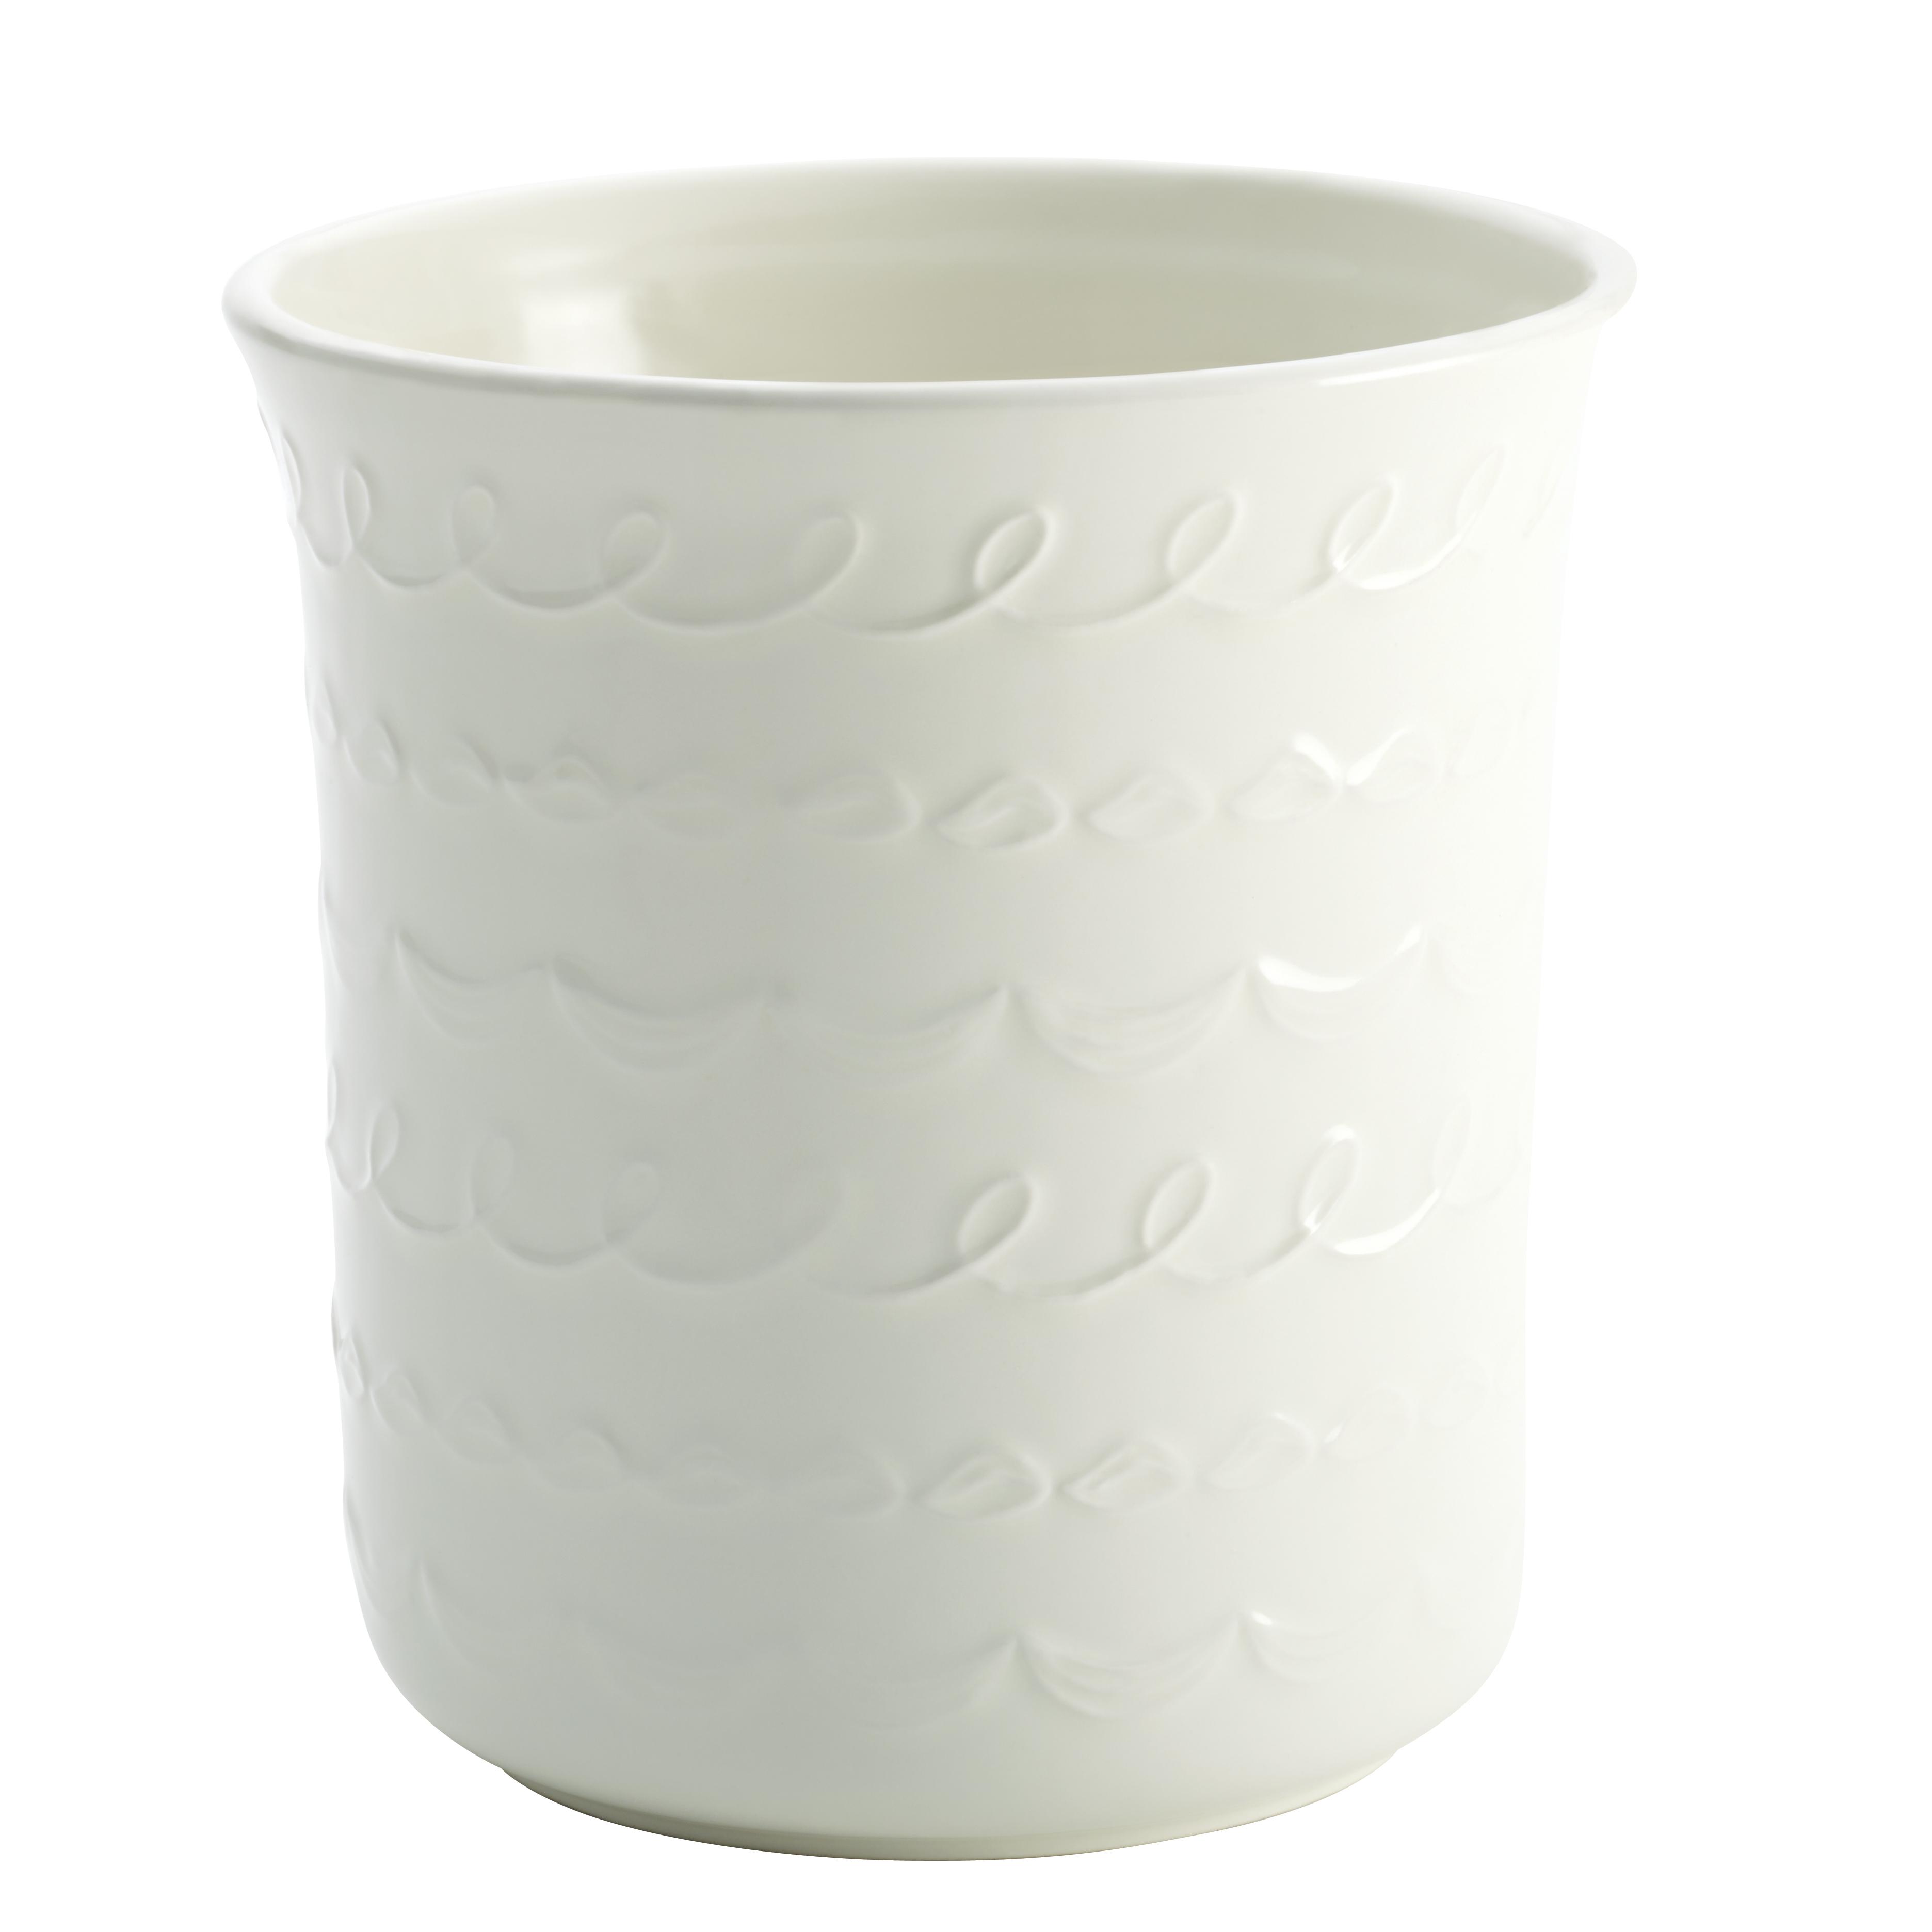 Cake Boss White Ceramic Icing Pattern Utensil Crock